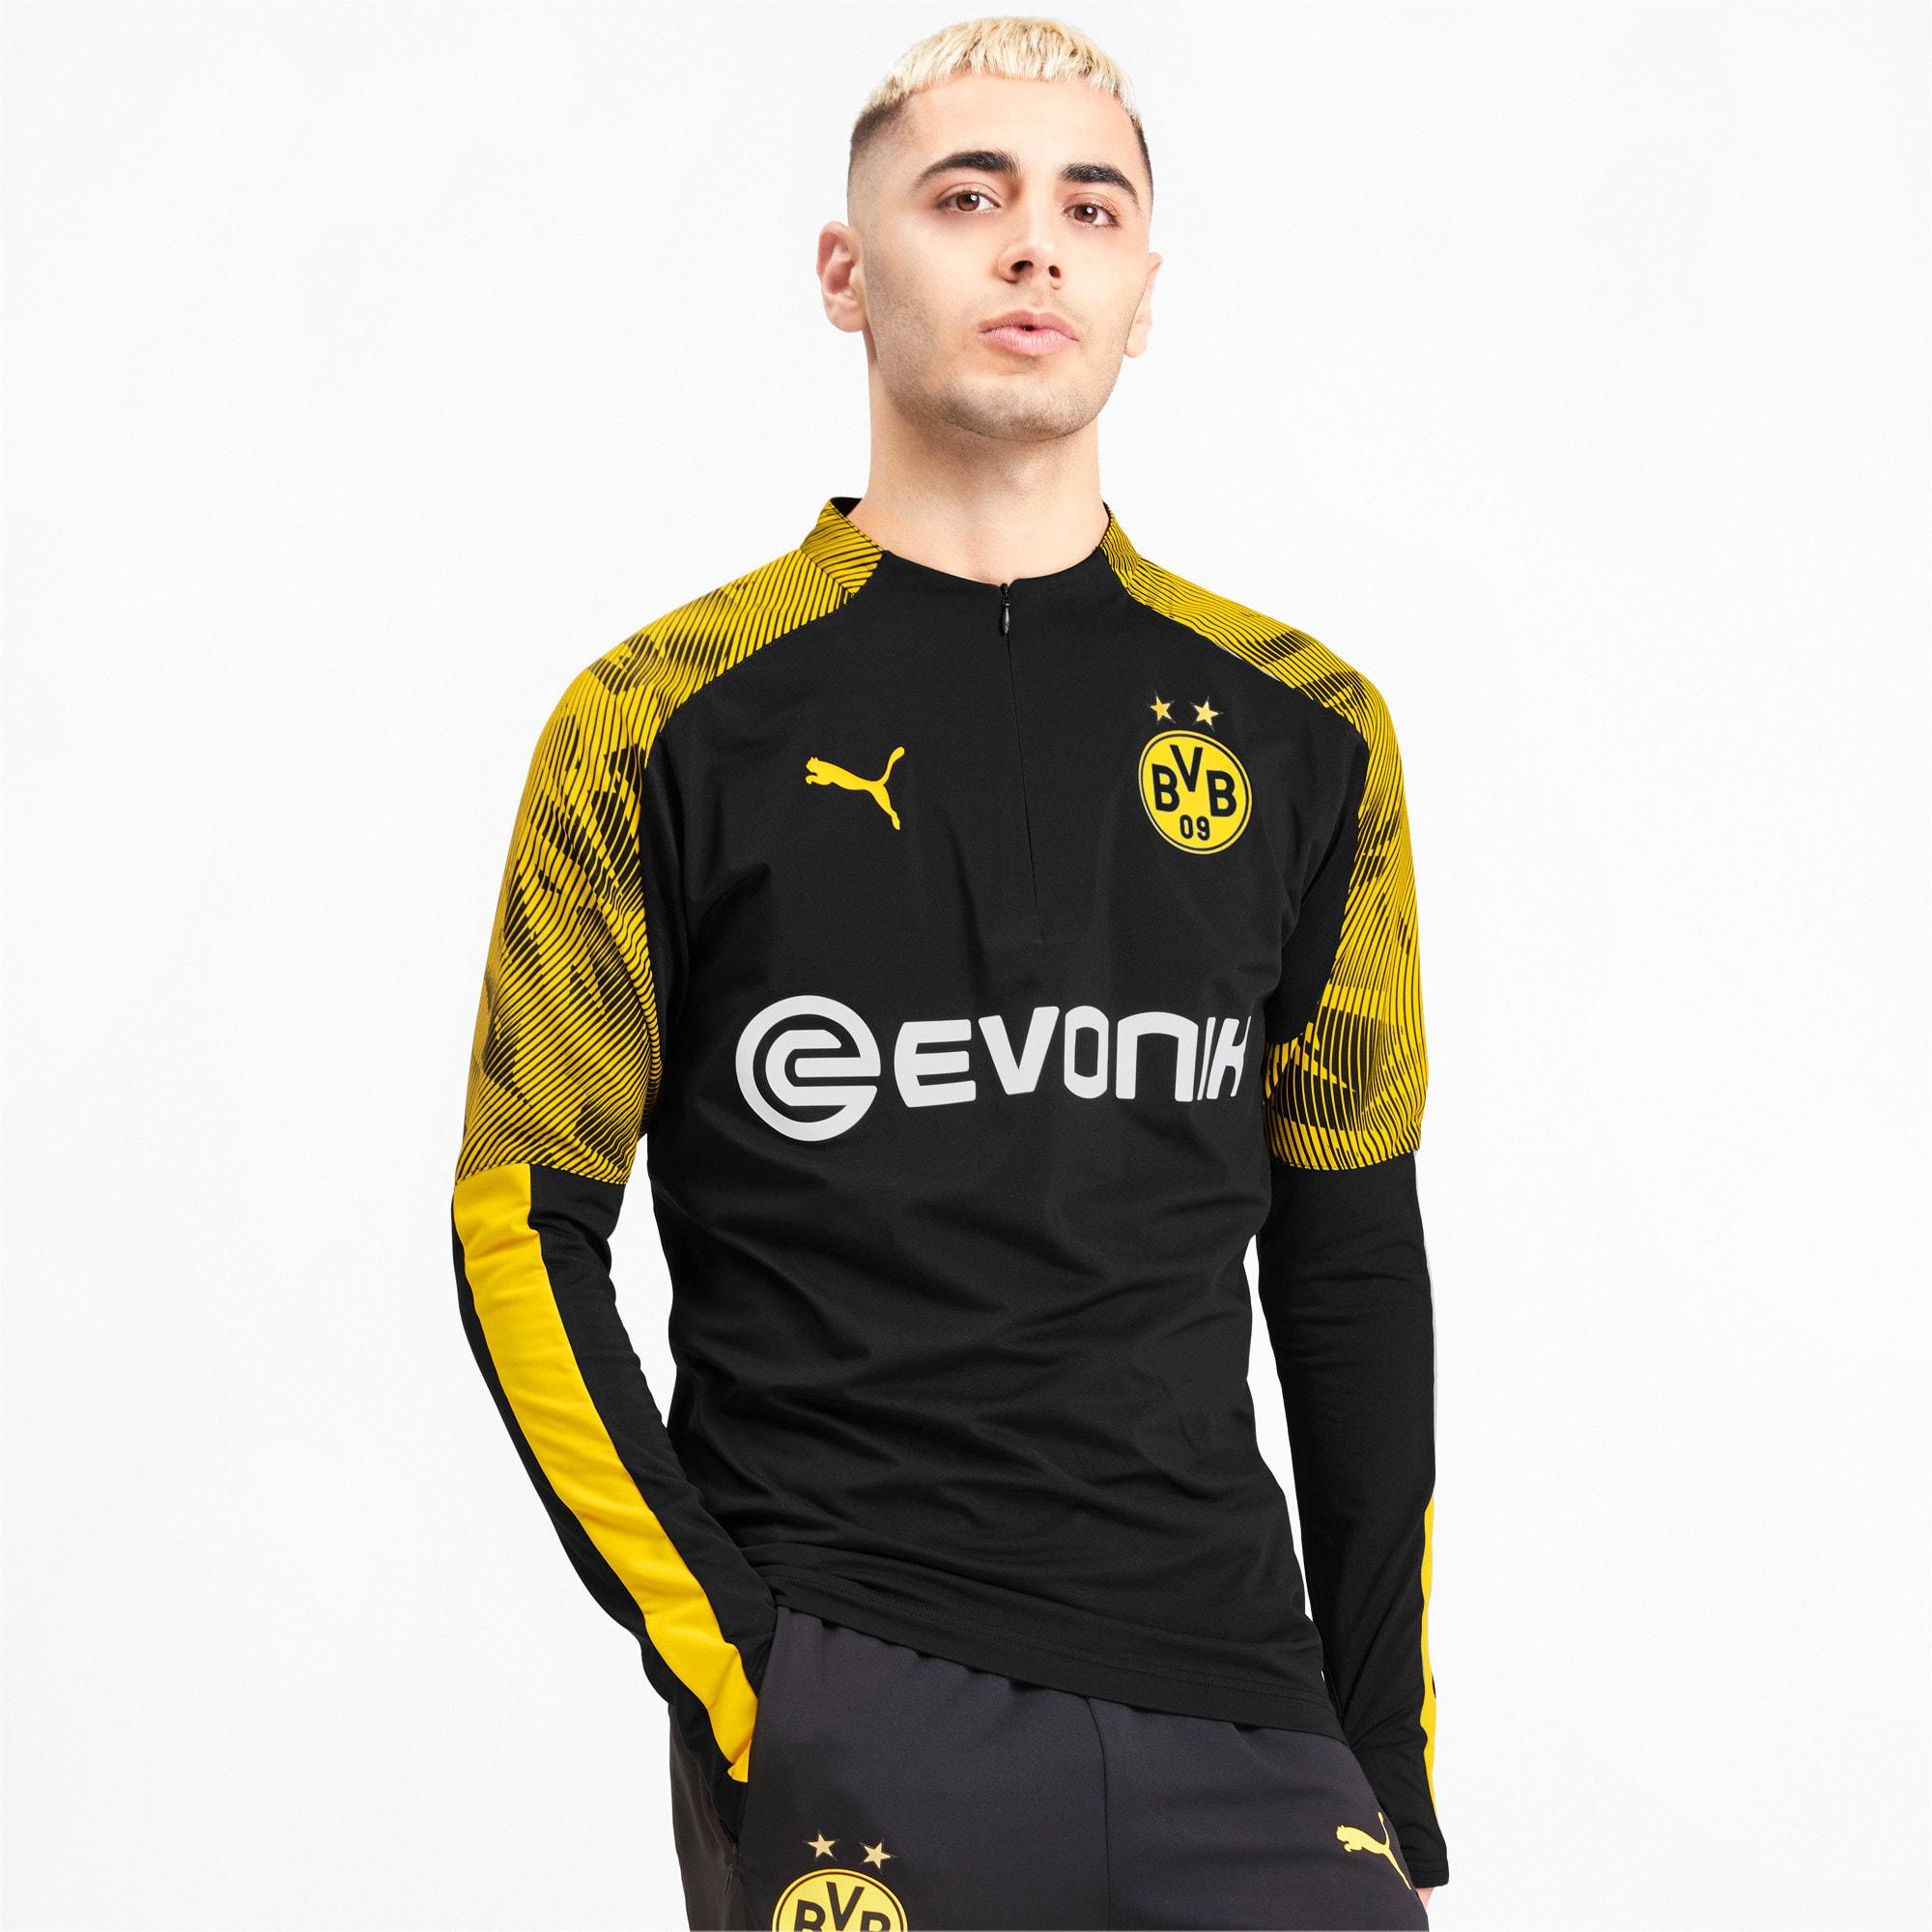 Thumbnail 1 of BVB Men's 1/4 Zip Training Top, Puma Black-Cyber Yellow, medium